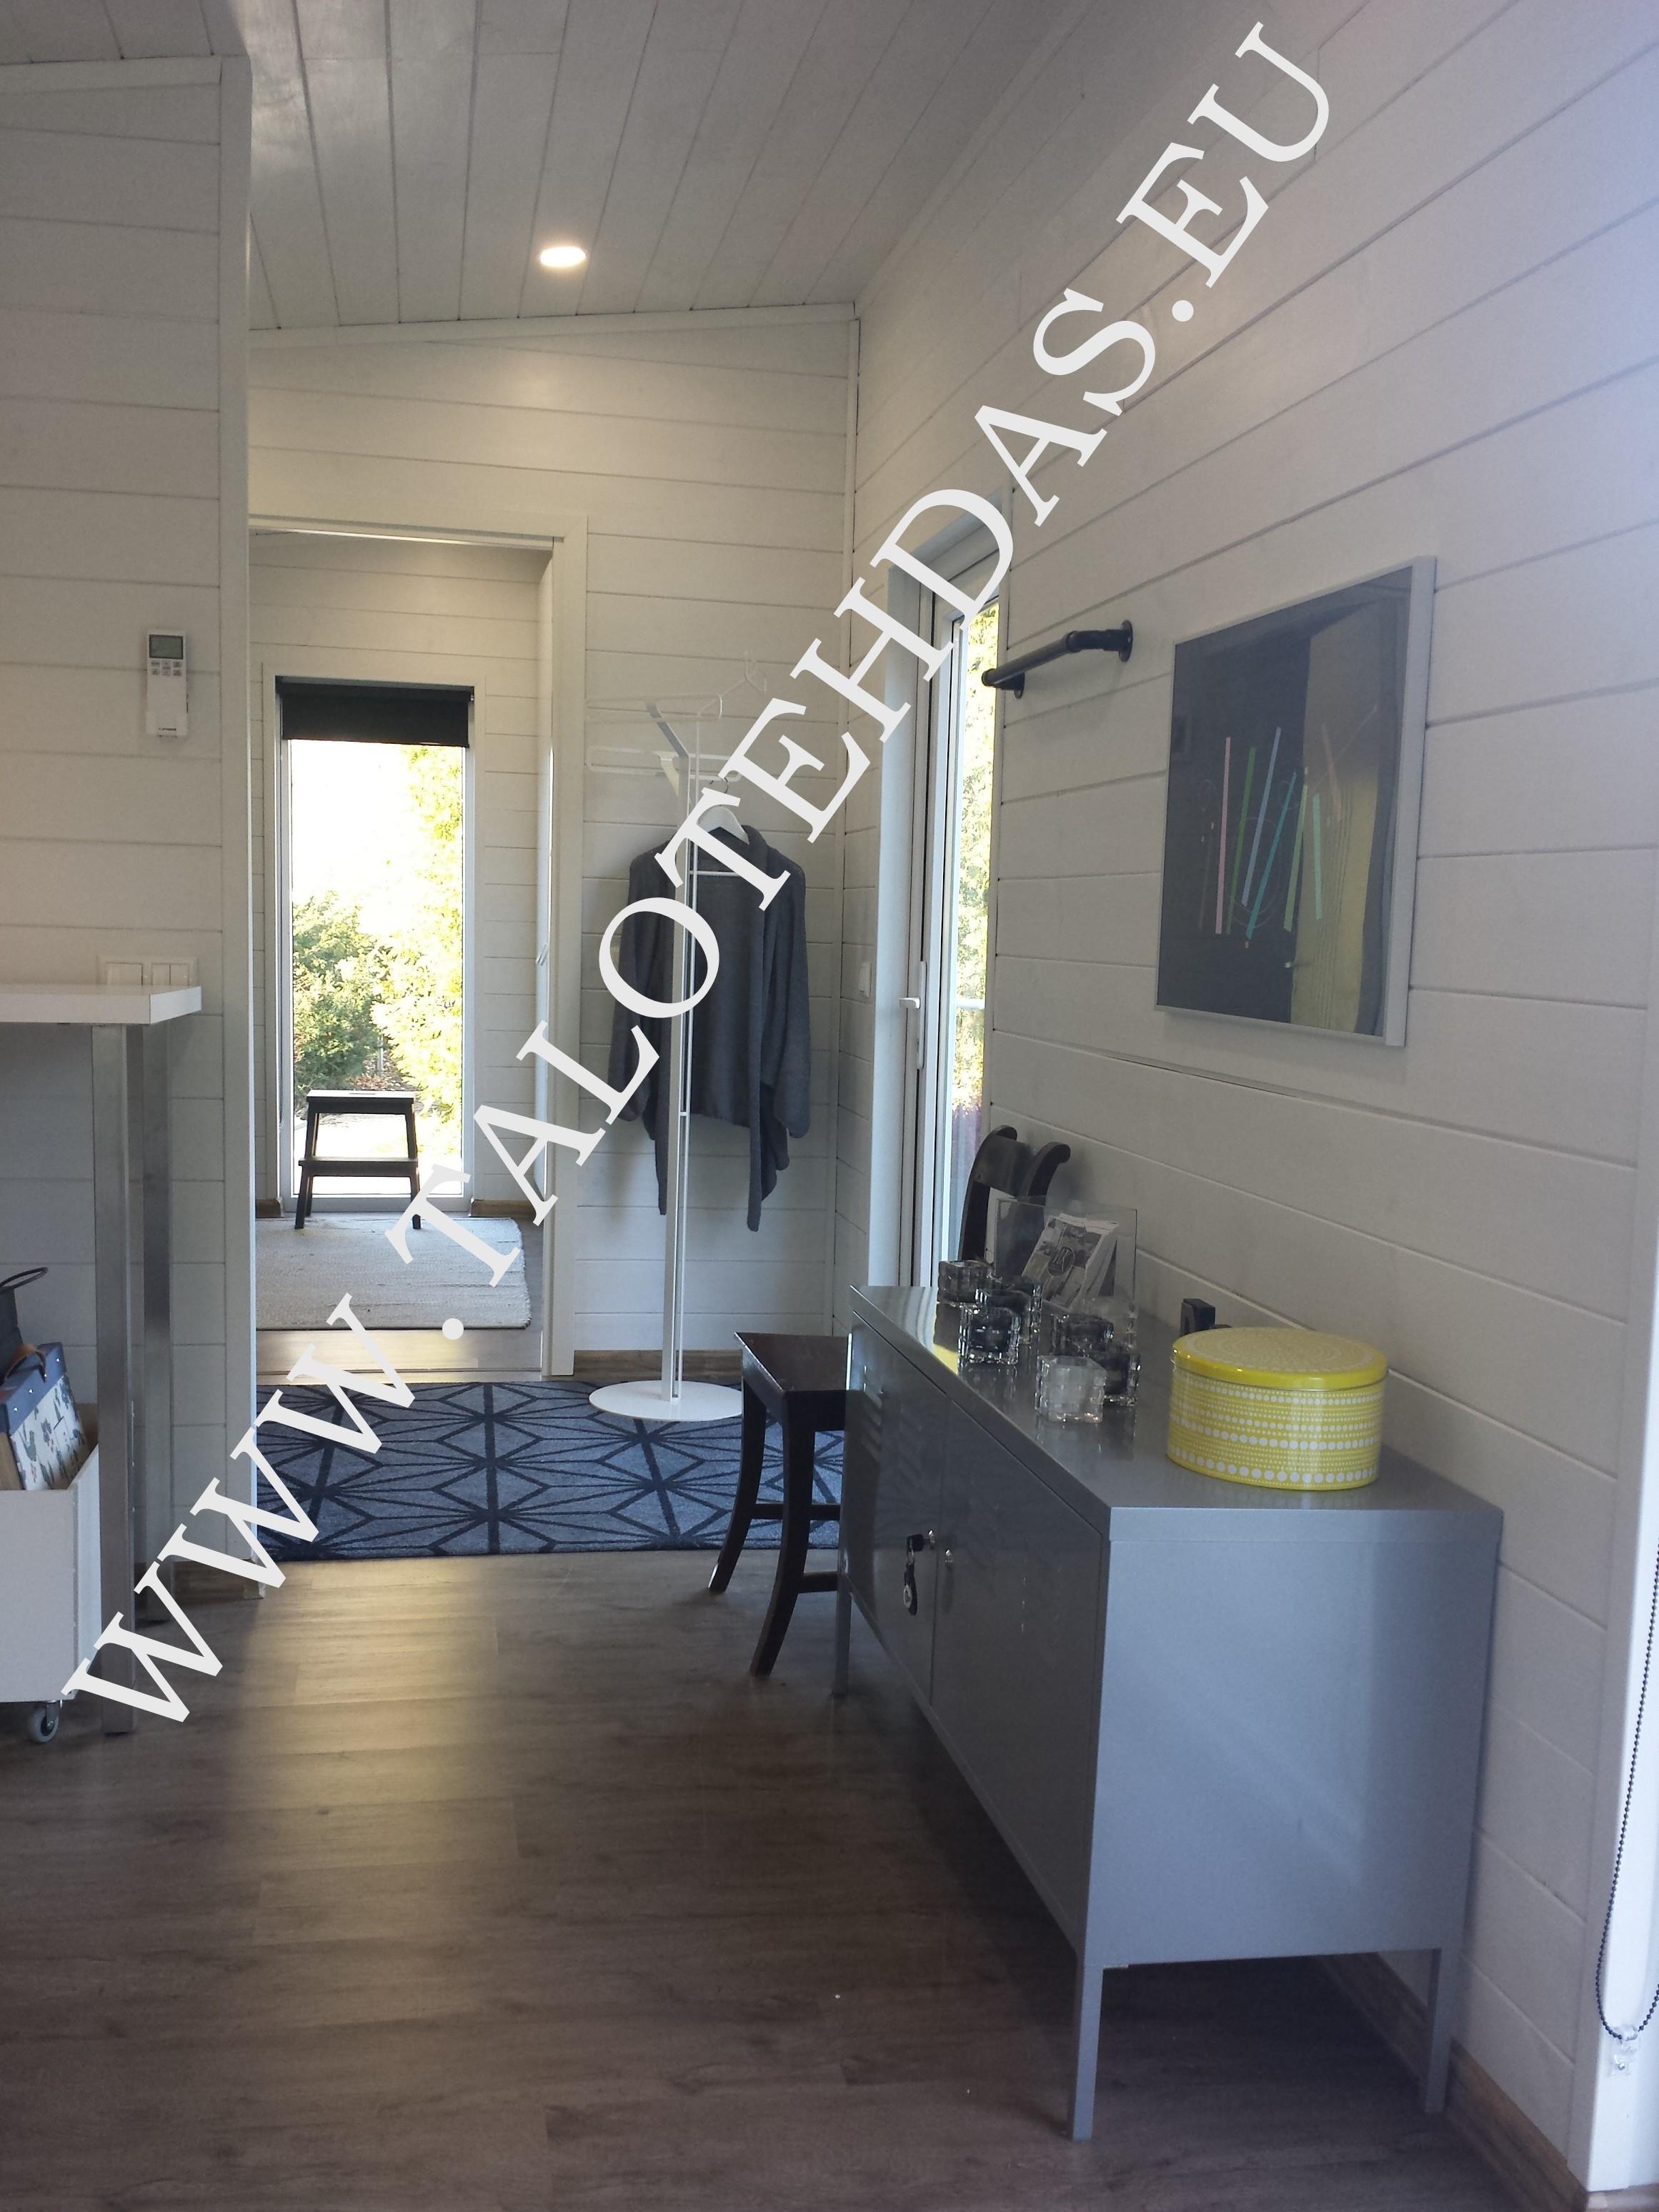 Talovaunu pulpettikatto 12x4,3, husvogn, static caravan, mobile home, shed roof